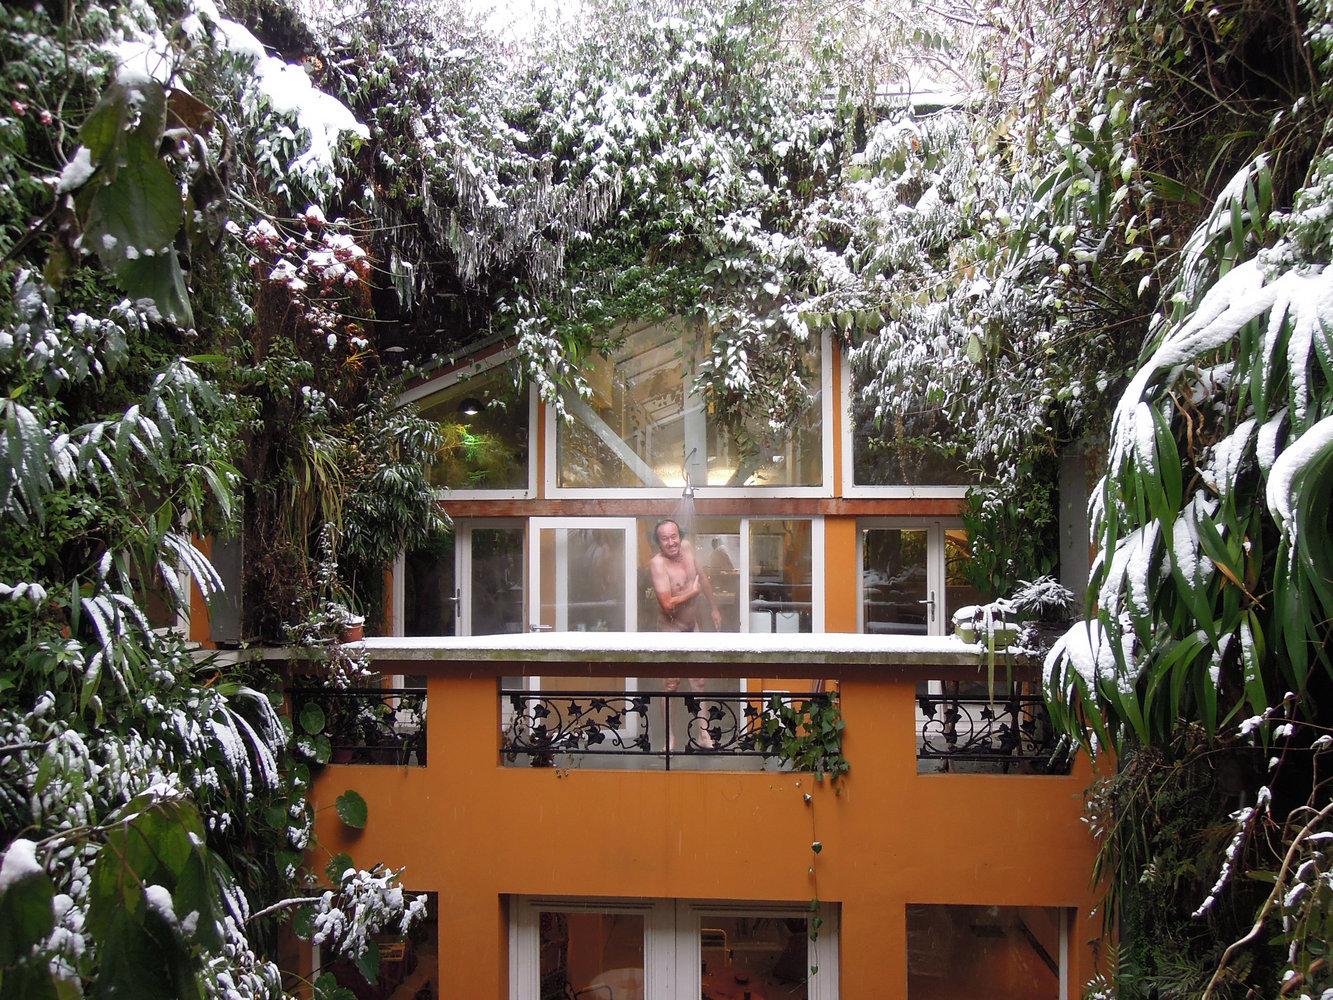 patrick blanc 39 s house vertical garden patrick blanc. Black Bedroom Furniture Sets. Home Design Ideas